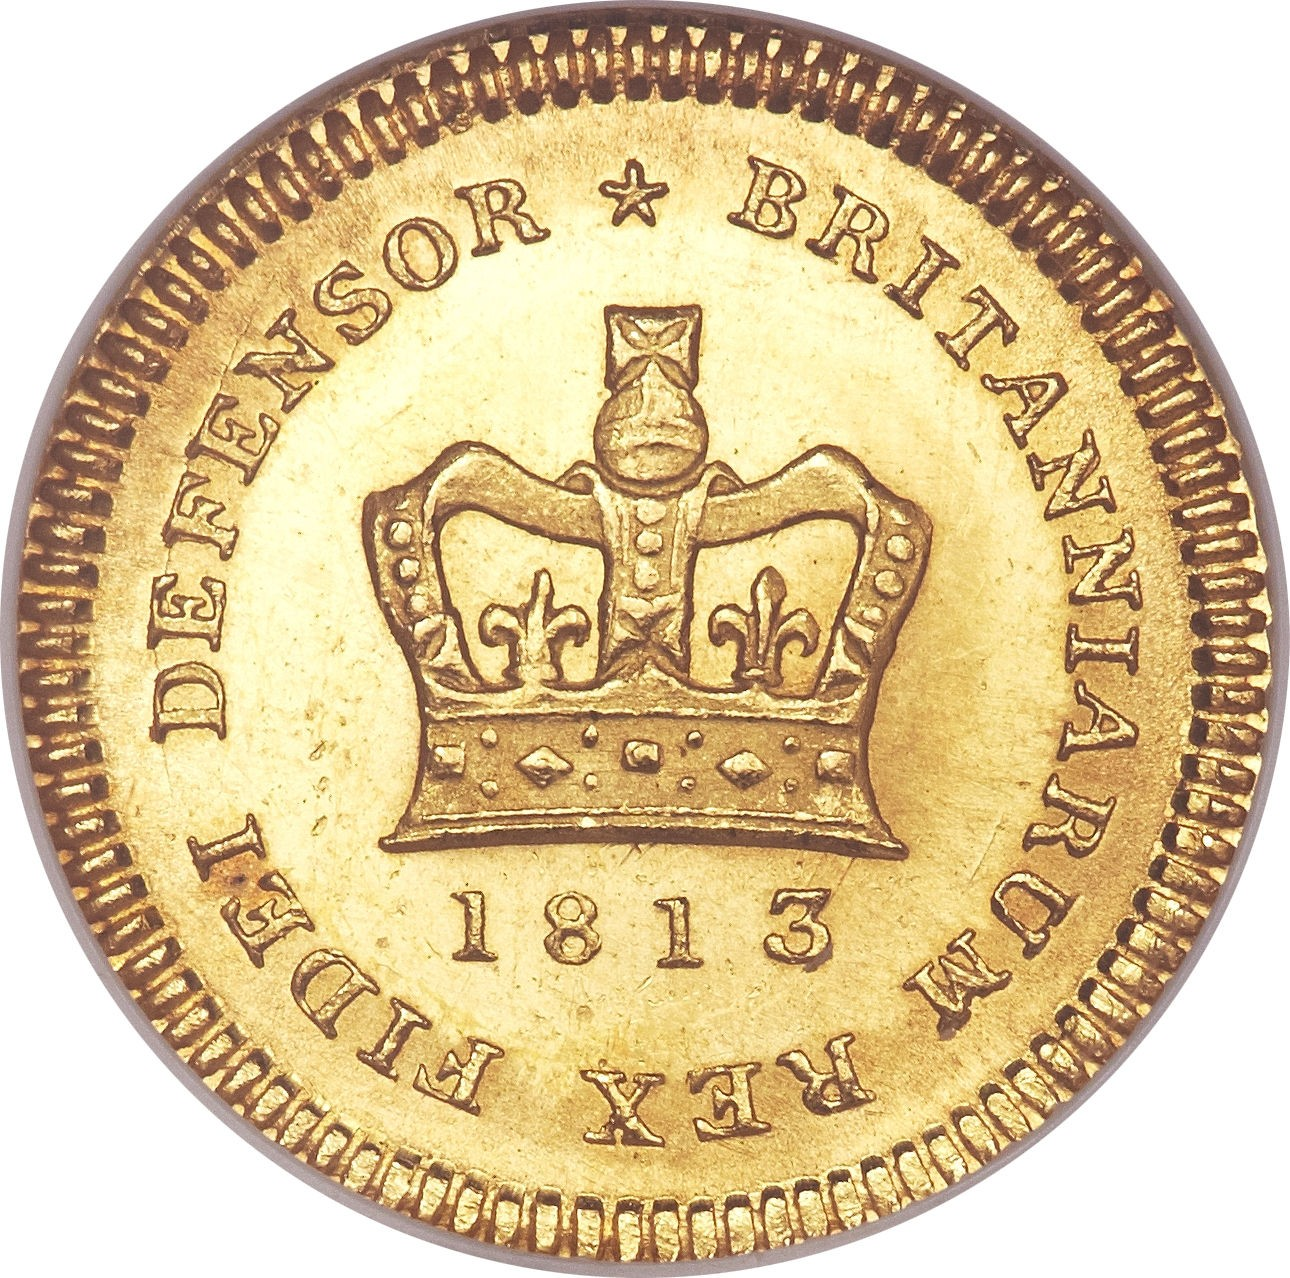 British ⅓ Guinea (1804-1813 George III)